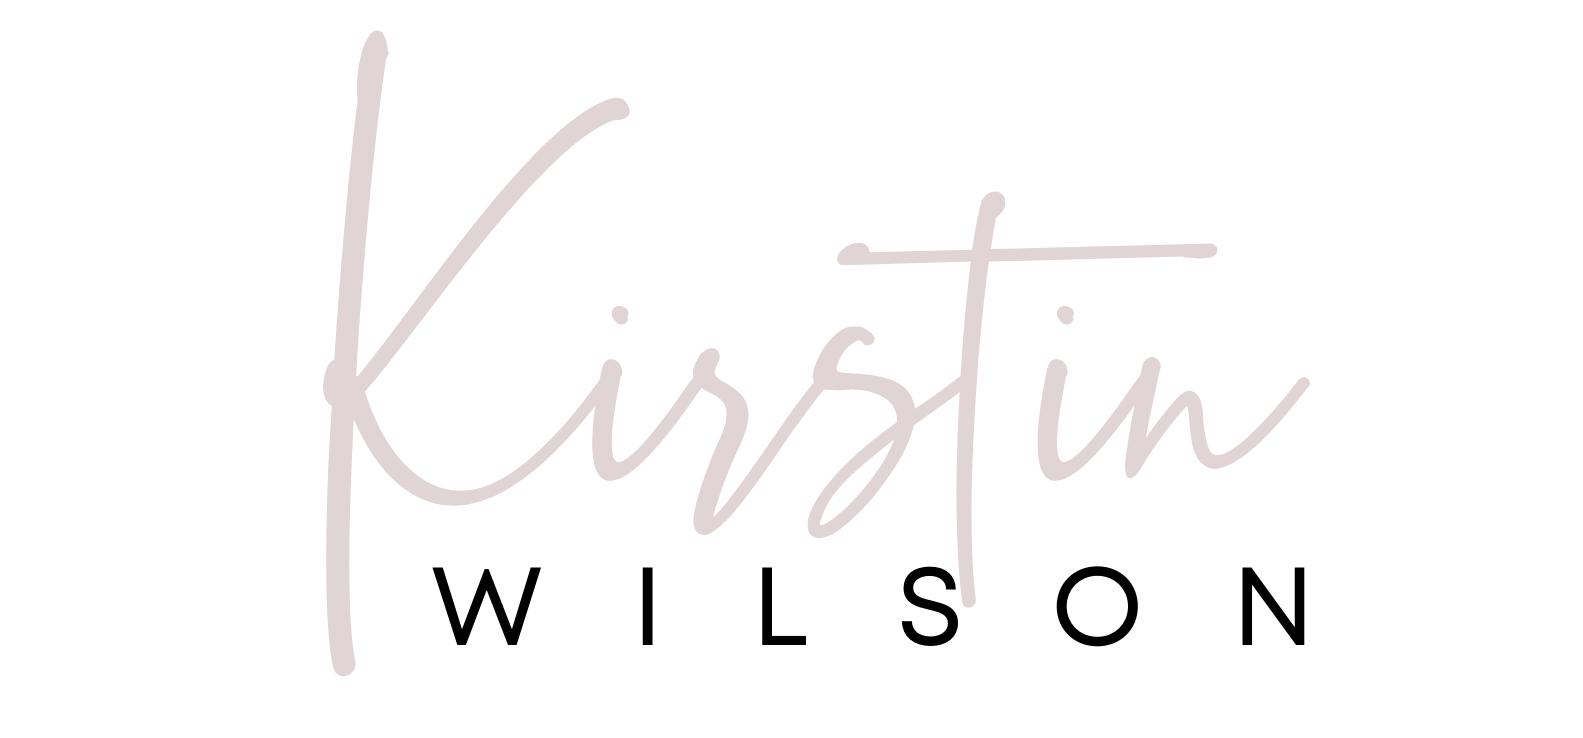 Kirstin Wilson